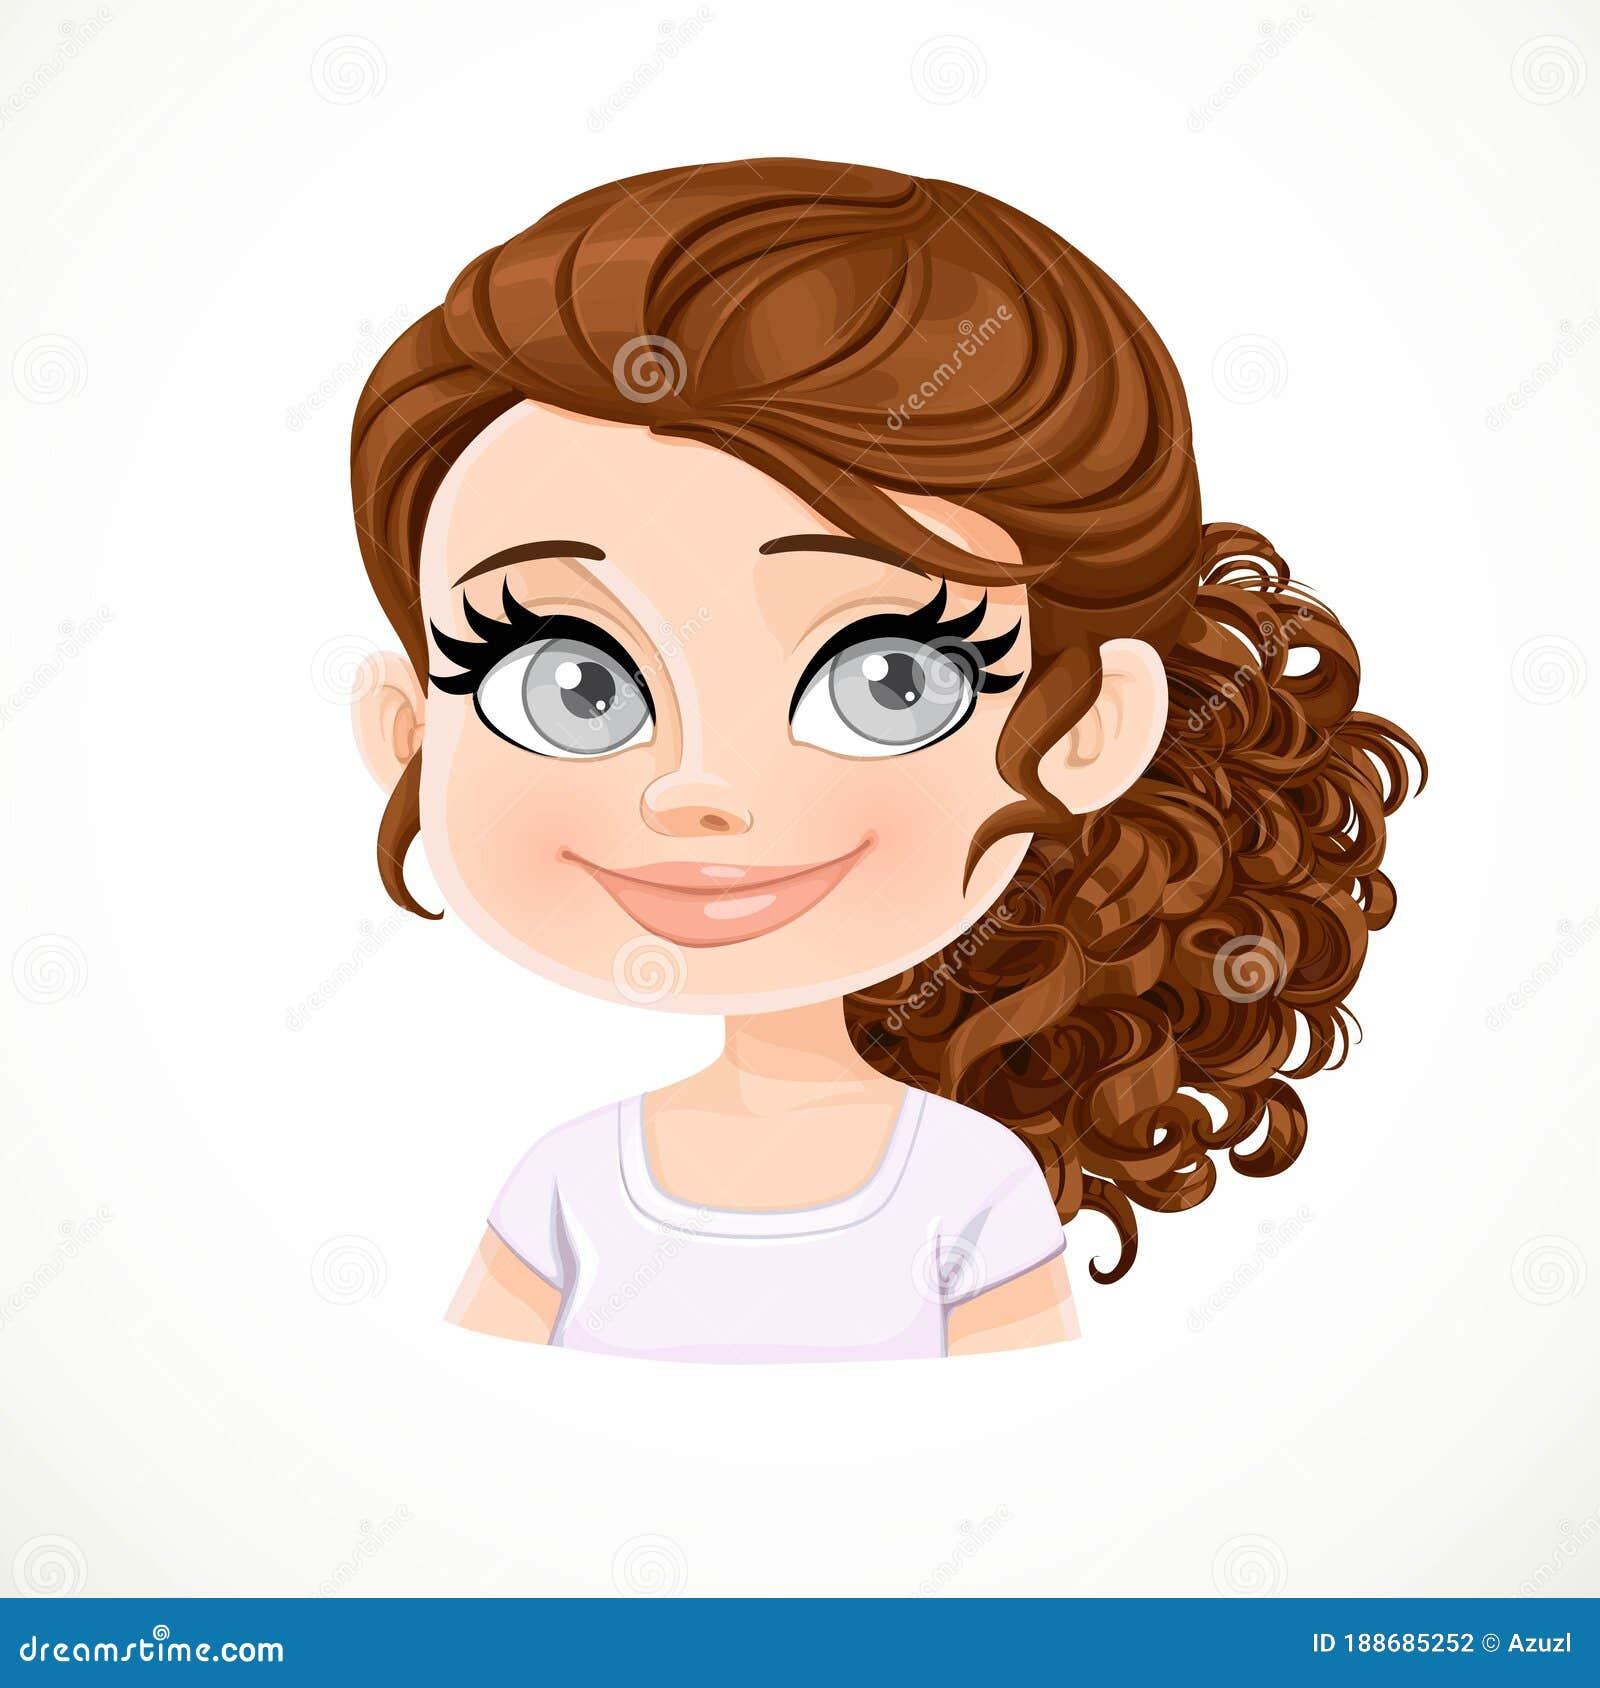 20 142 Cartoon Girl Photos Free Royalty Free Stock Photos From Dreamstime